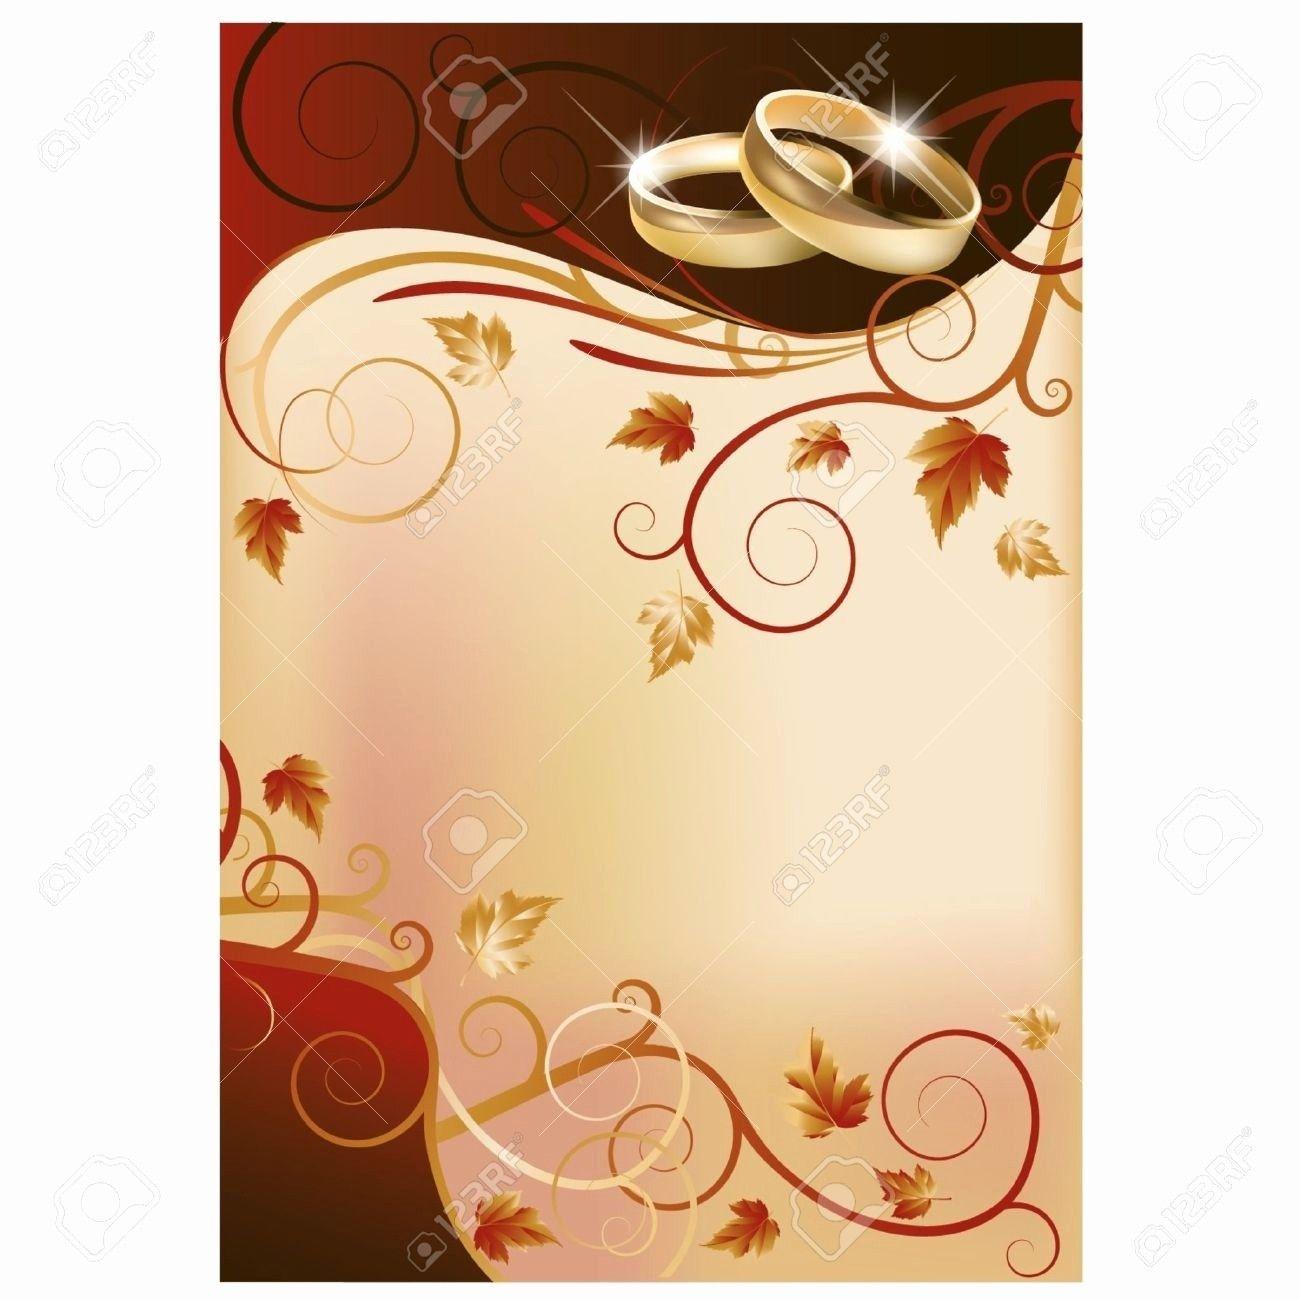 ideas blank wedding invitation cards in